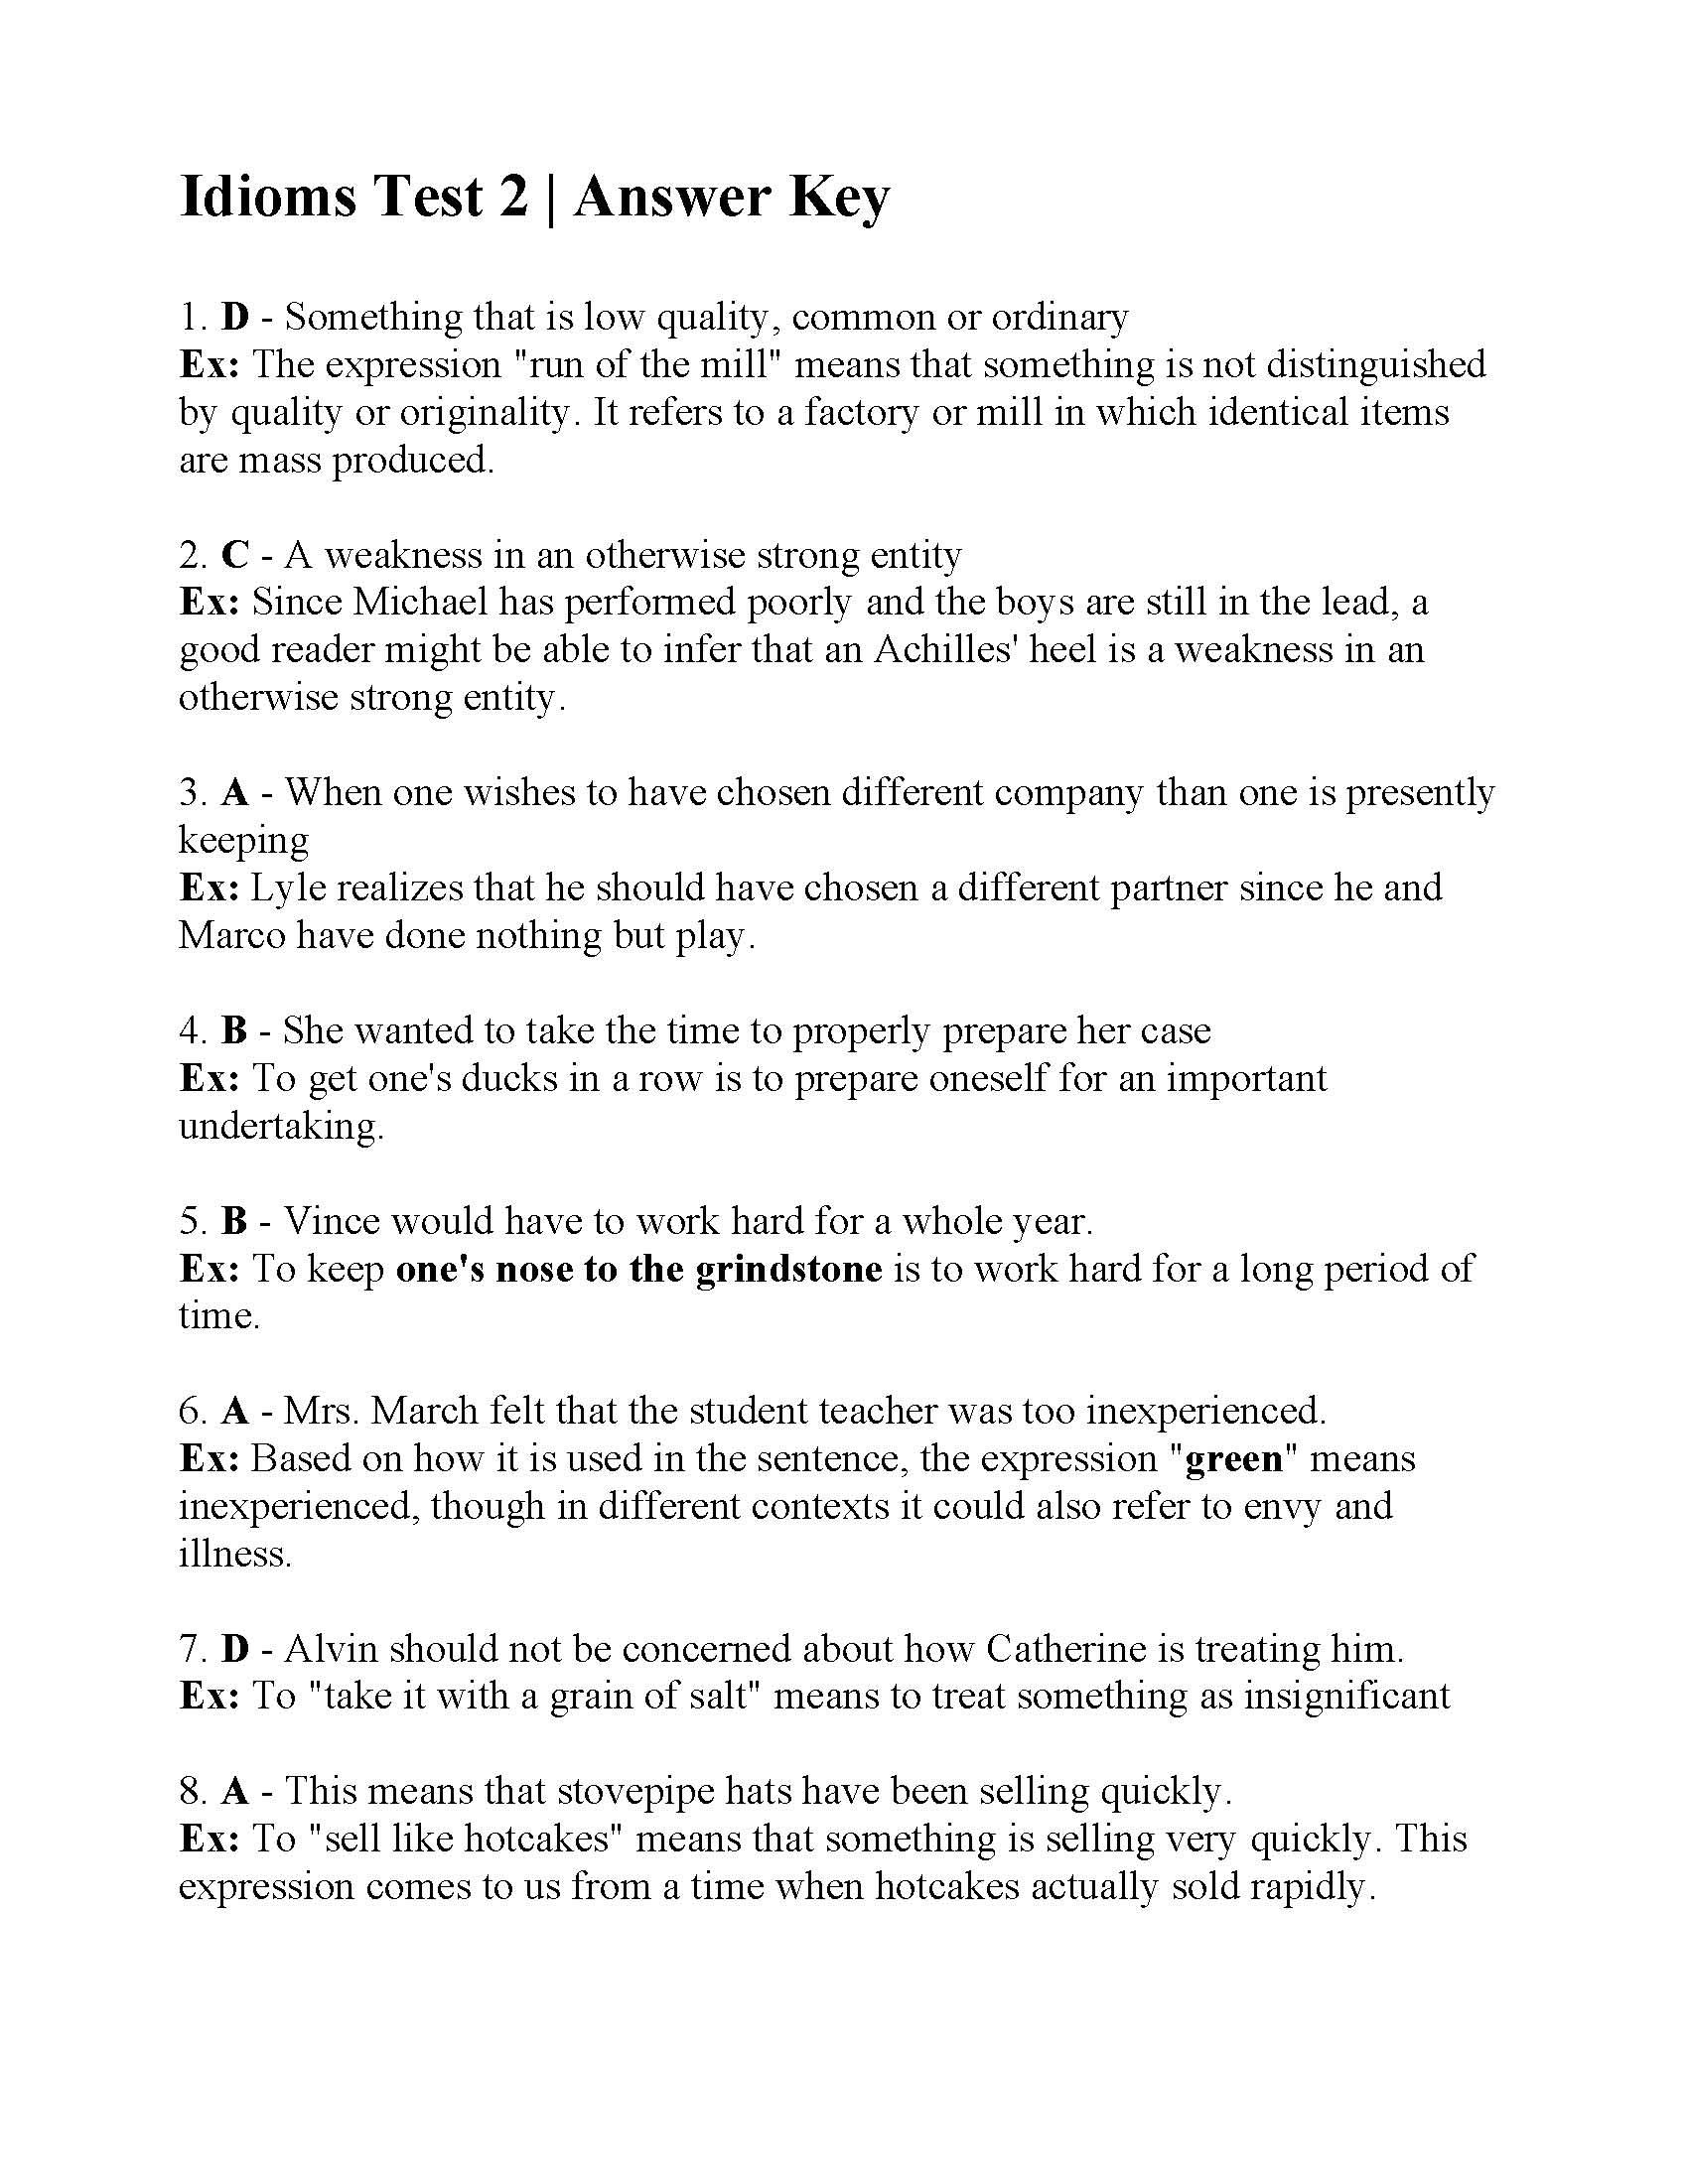 Helpful Idiom Training For The Court Interpreter Written Exam